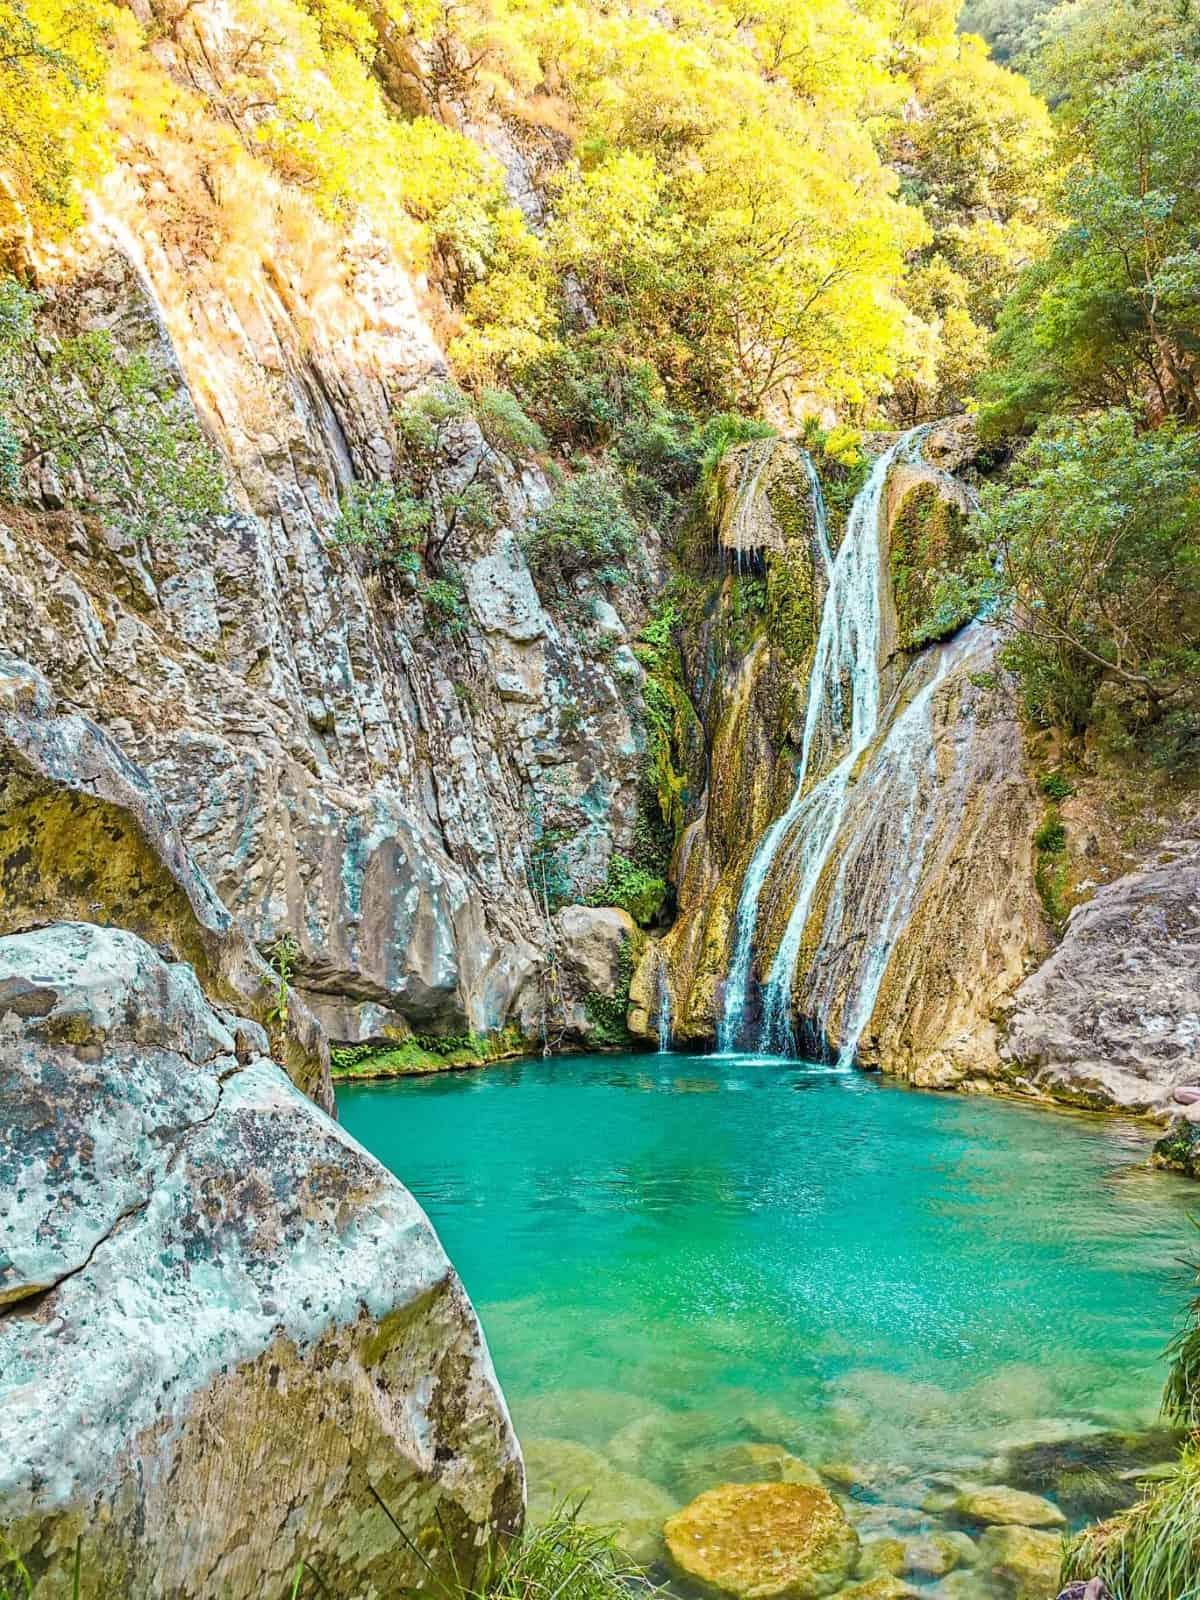 grece-continentale-road-trip-itineraire